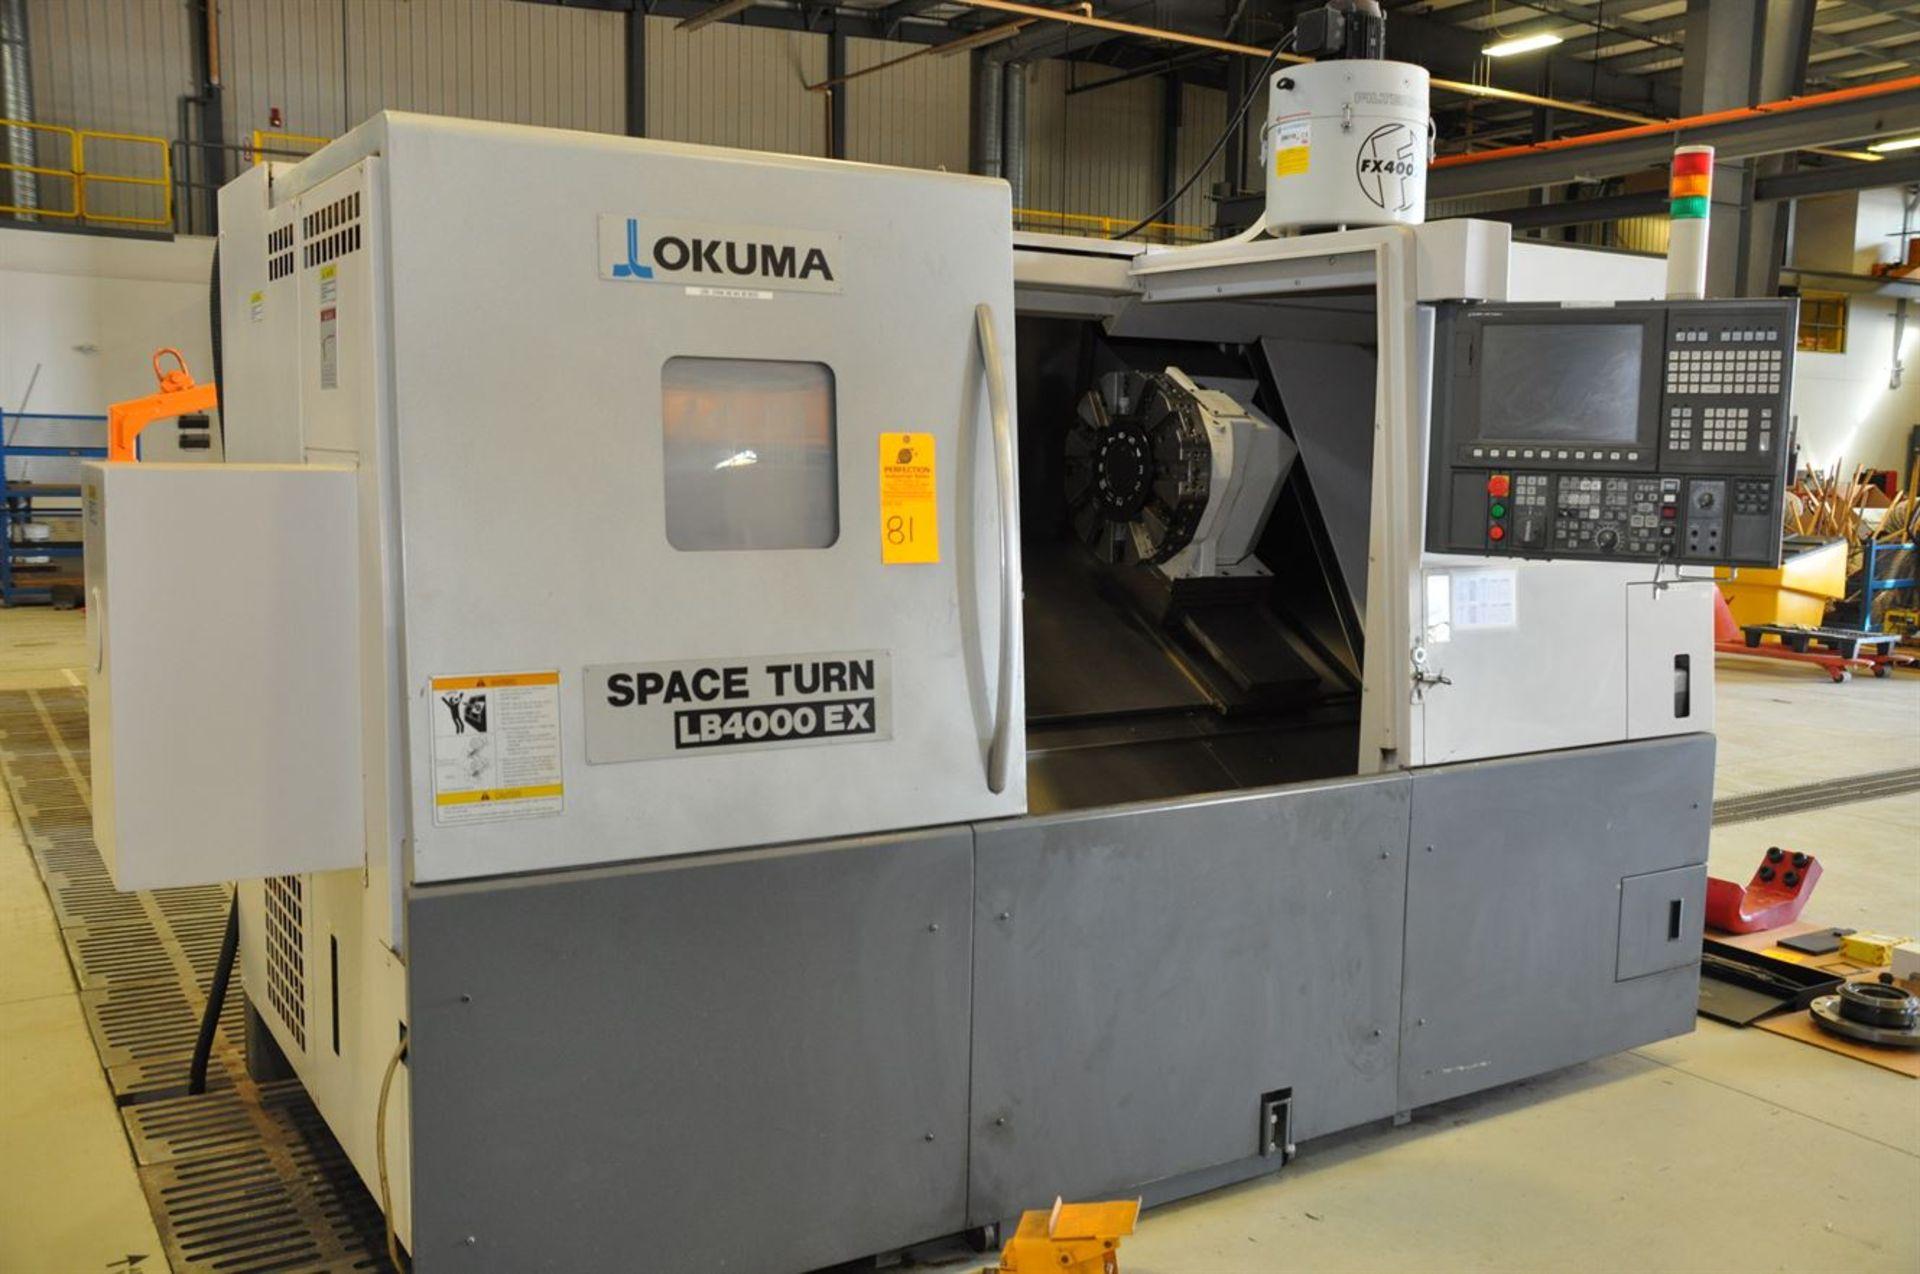 "2012 OKUMA SPACE TURN LB4000 EX CNC Chucker, s/n 161411, w/ OSP-P200LA Control, 3.5"" Bore, SCHUNK"